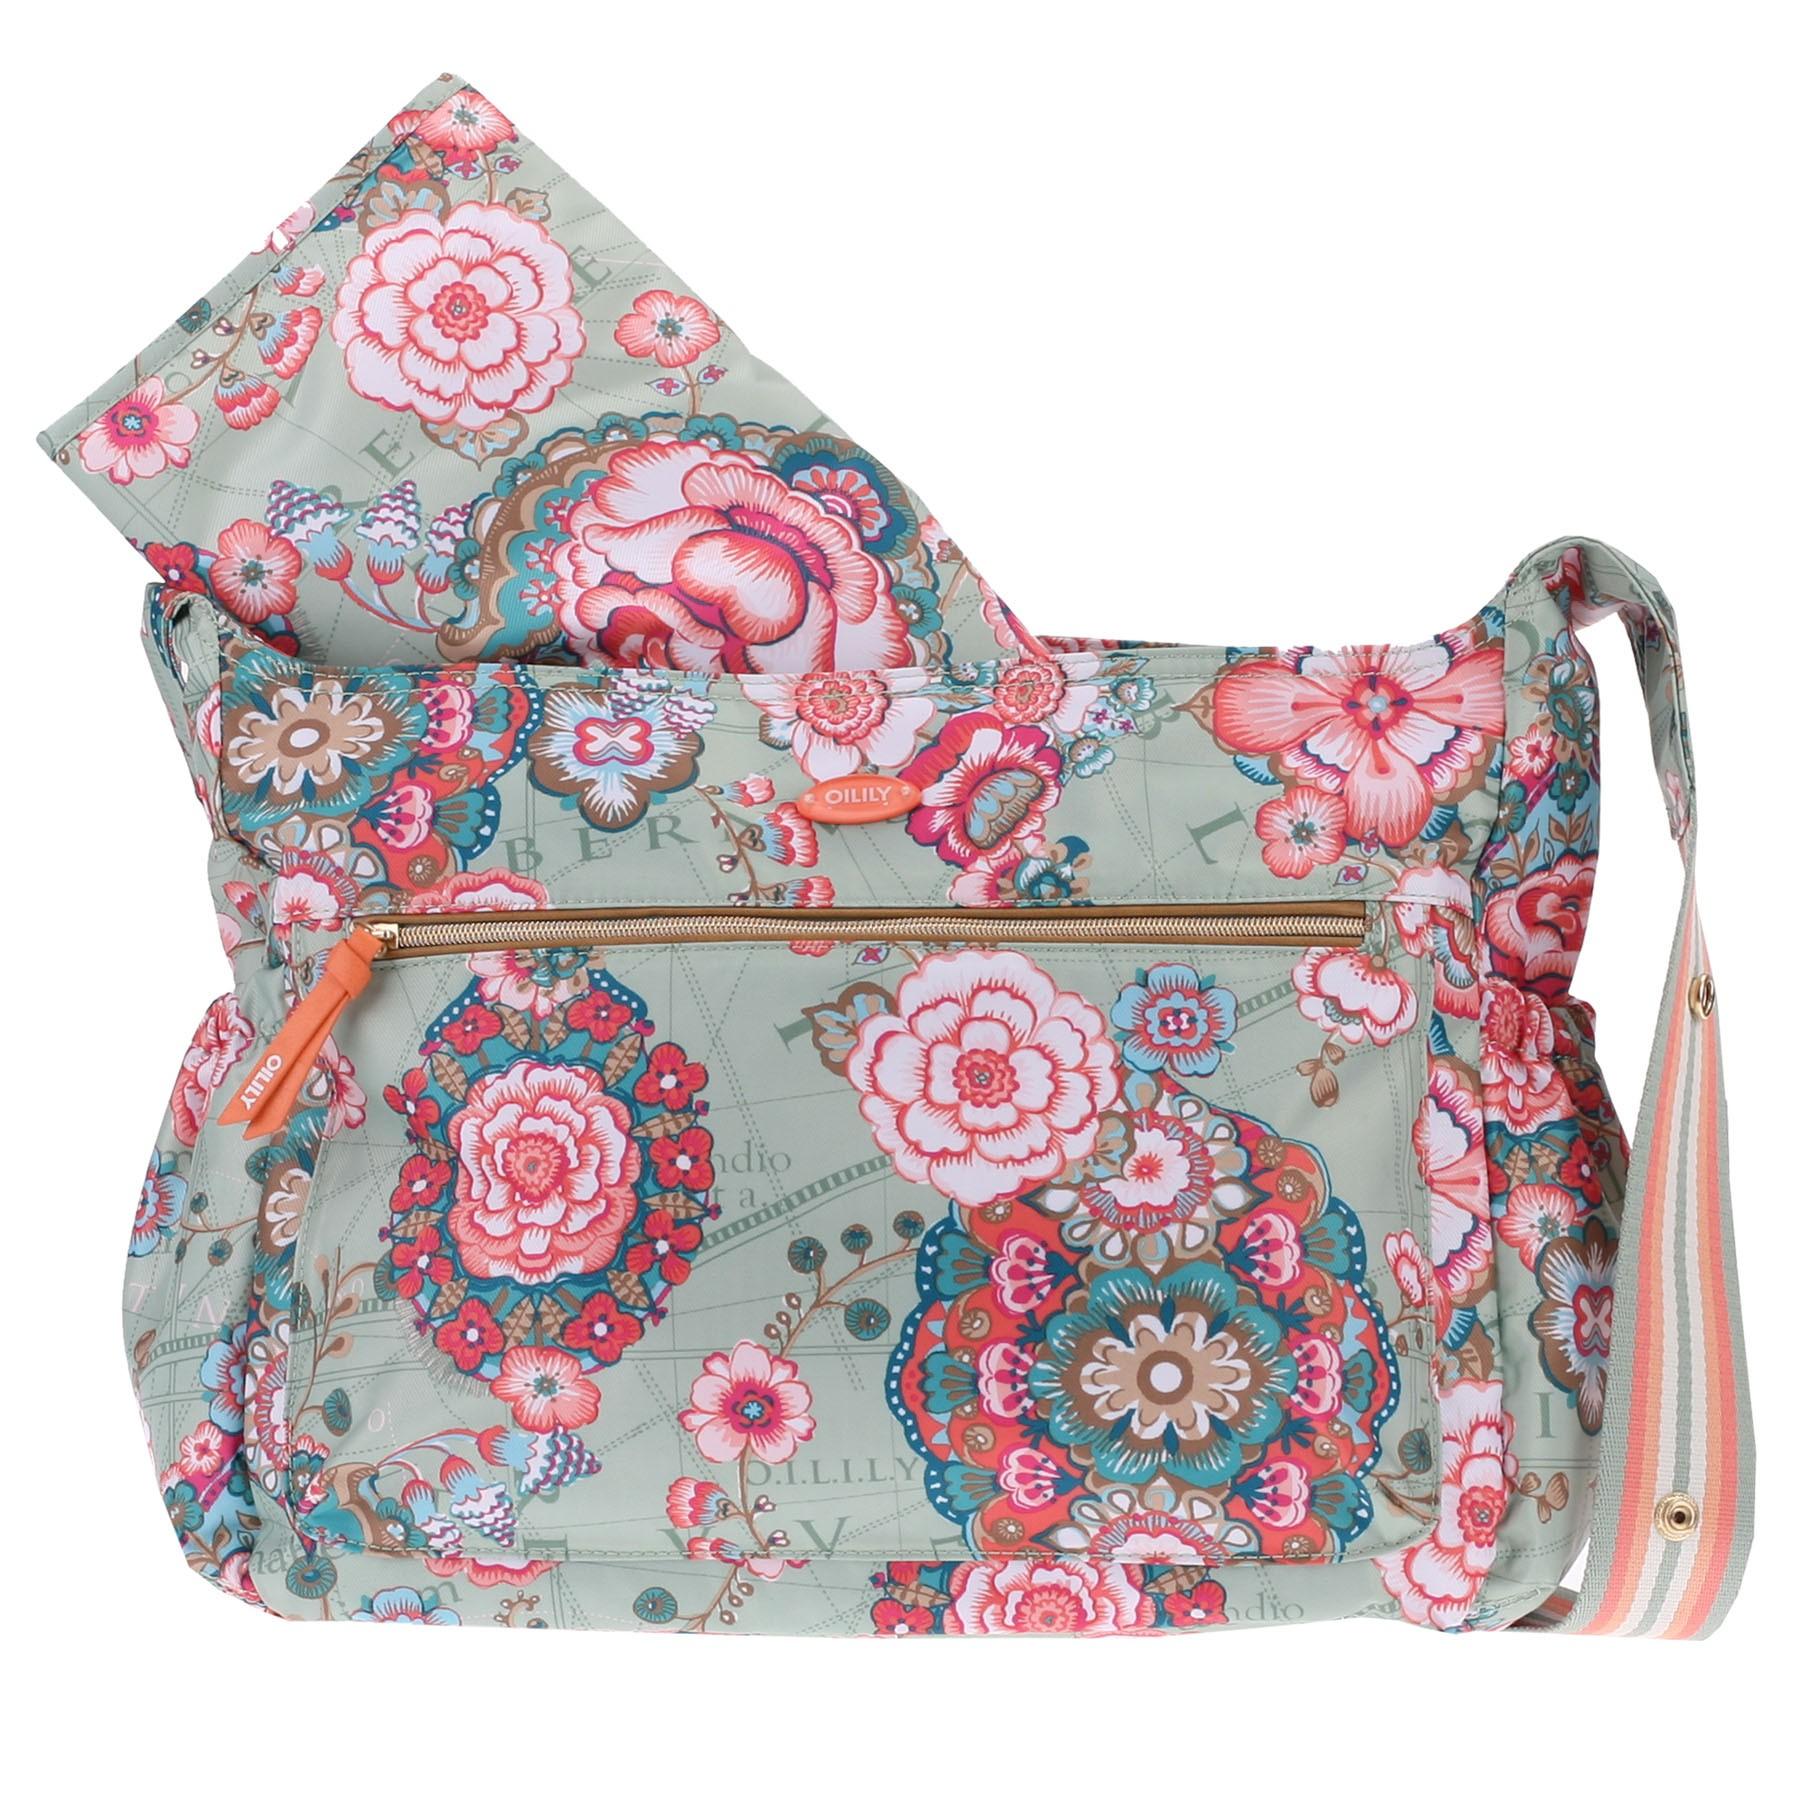 oilily wickeltasche baby bag fantasy flora pistachio ebay. Black Bedroom Furniture Sets. Home Design Ideas